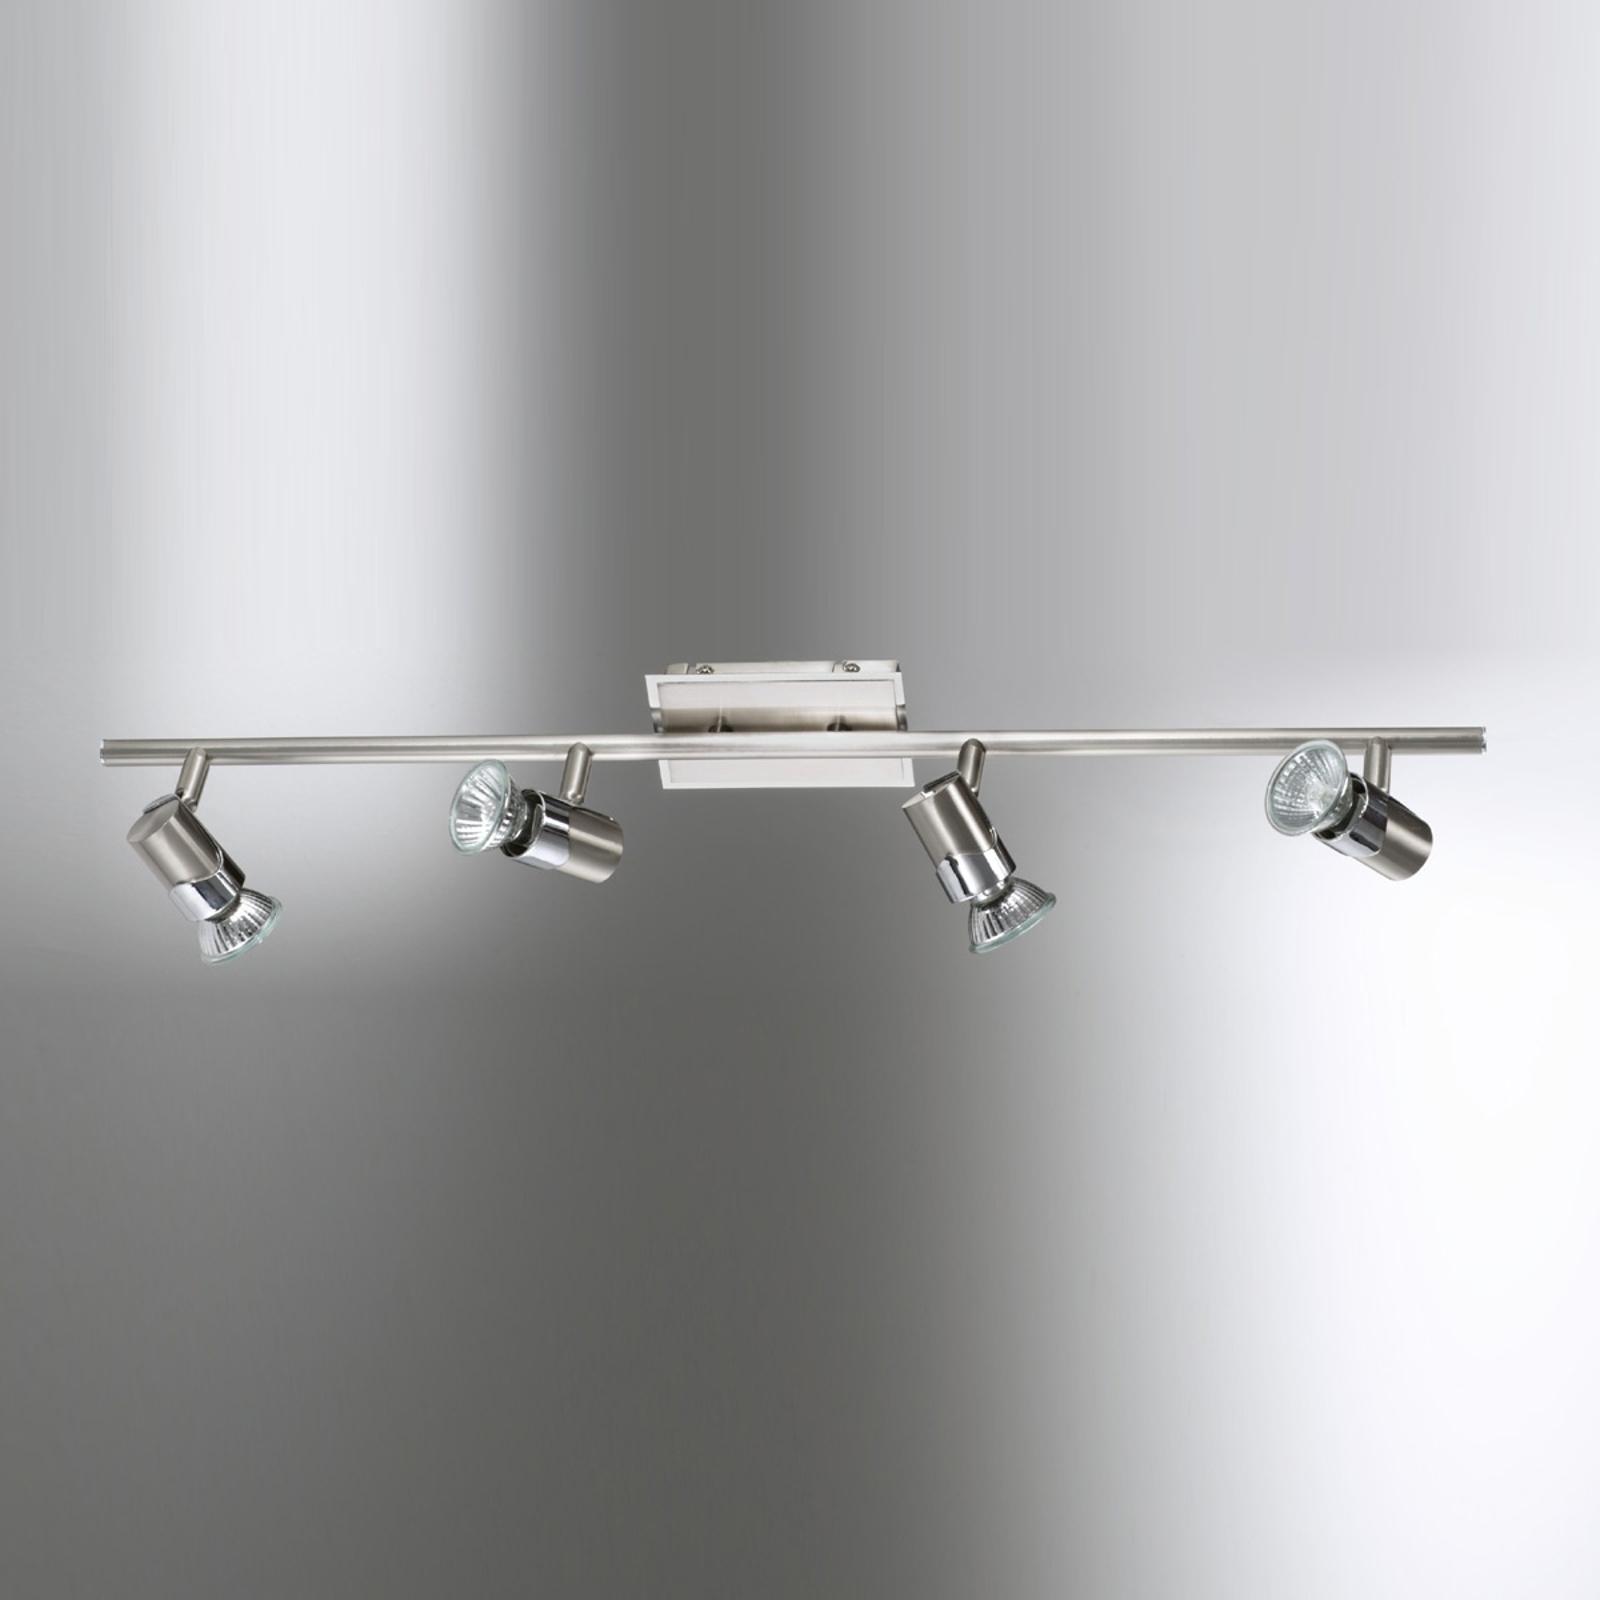 Ceiling light ALICE in a modern design_3501831_1